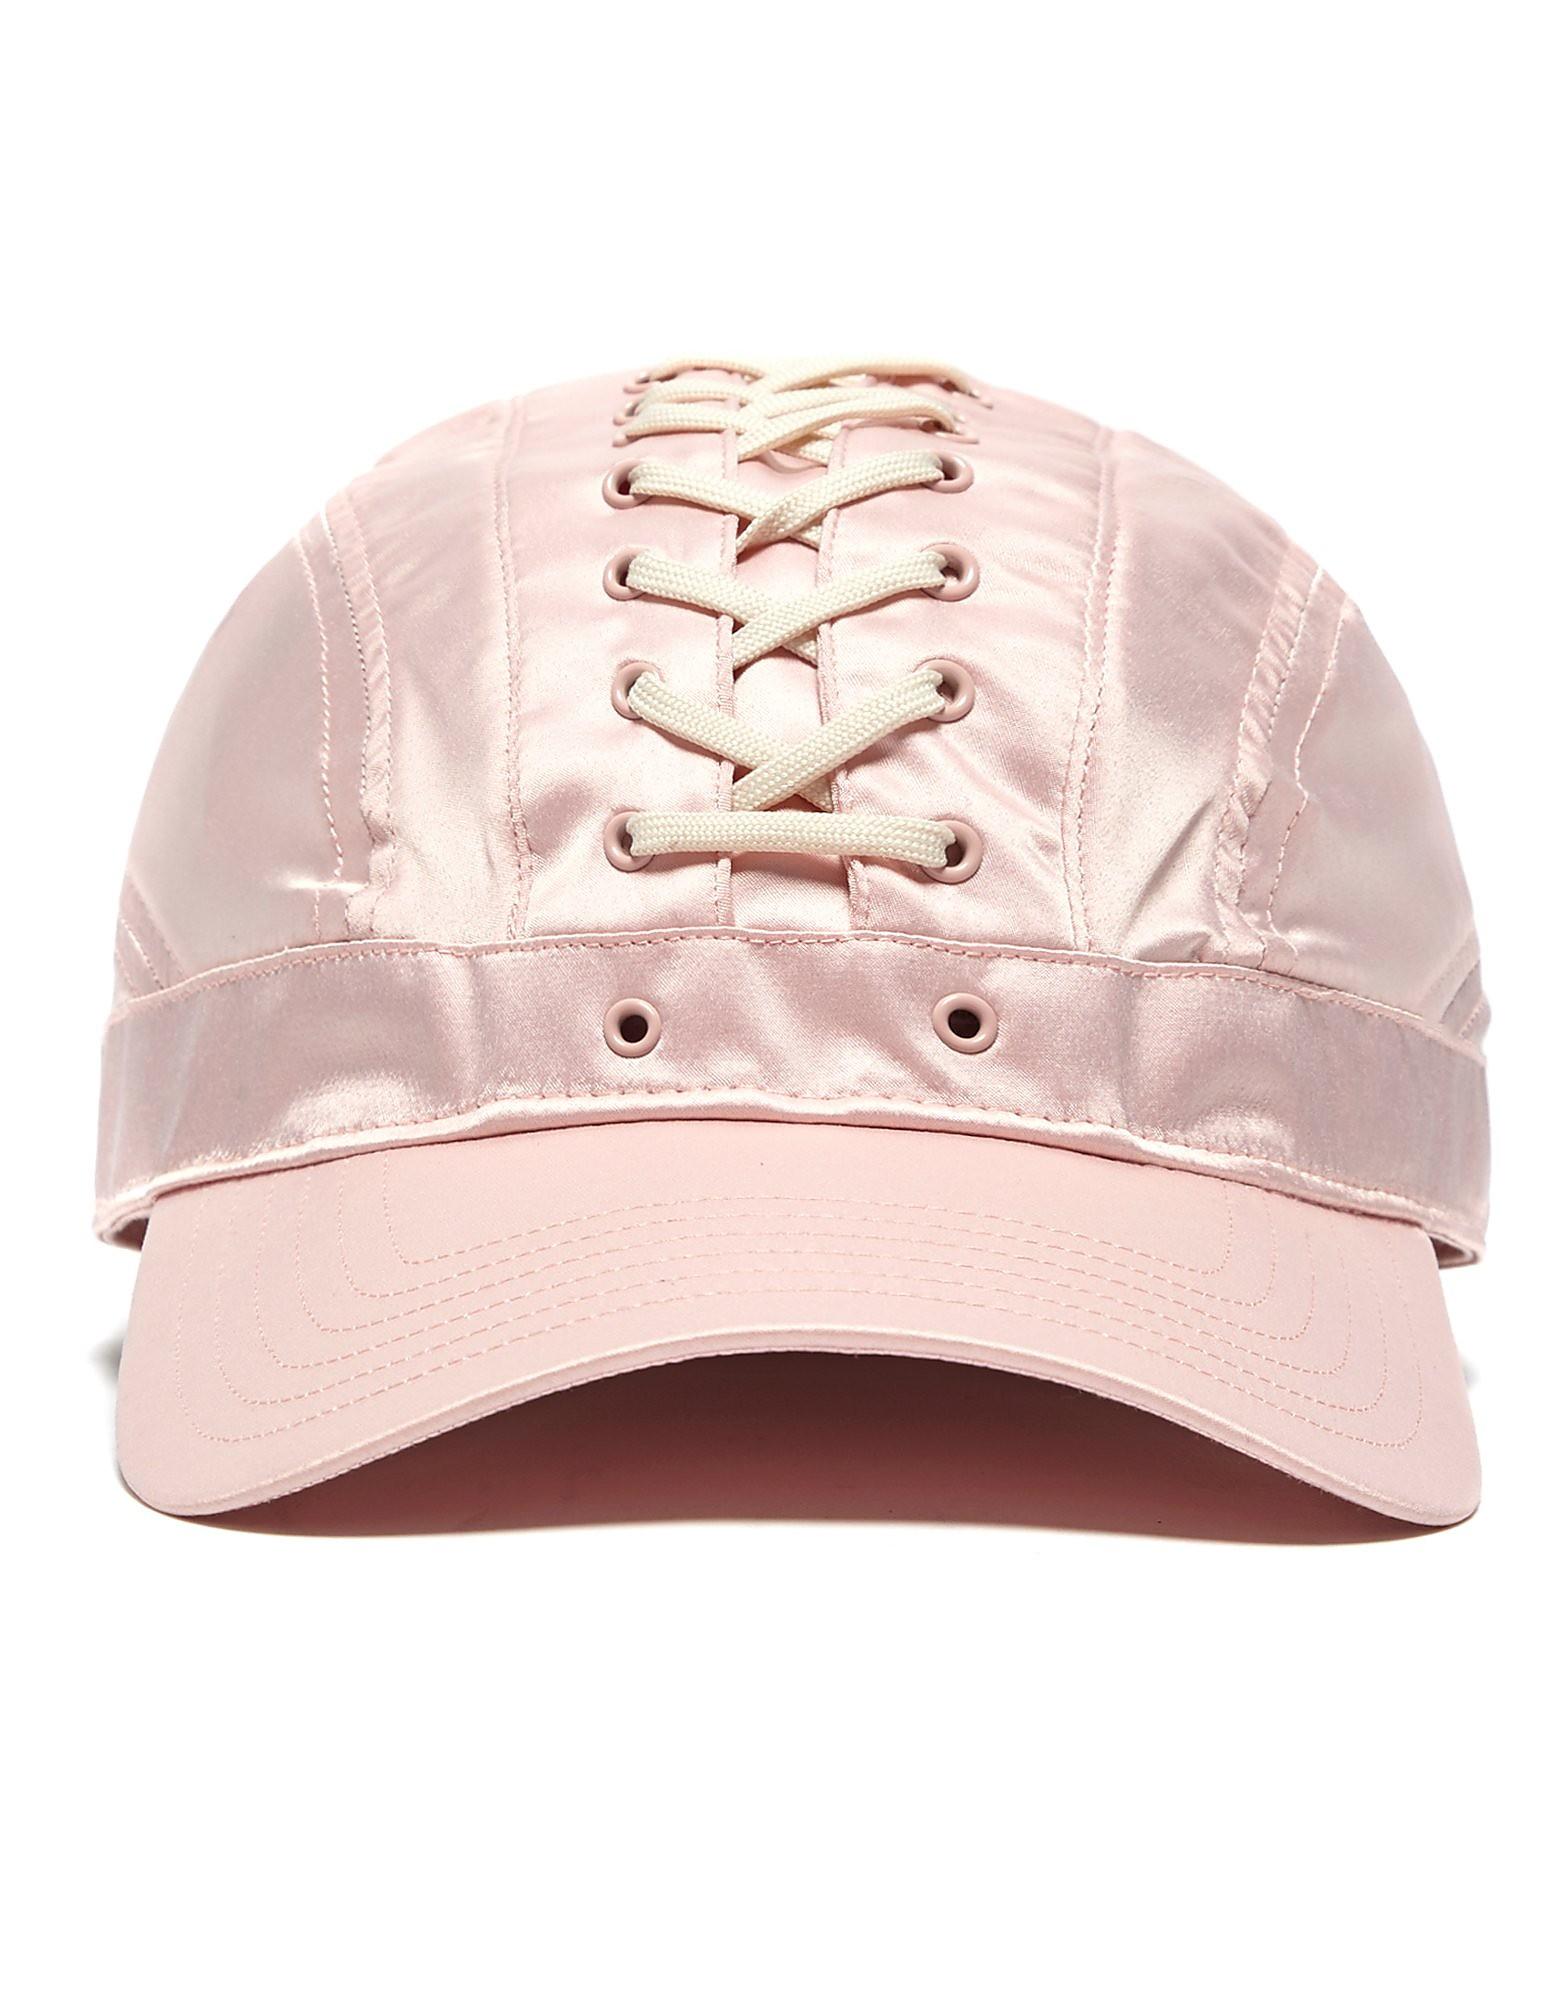 PUMA x Fenty Lace Cap